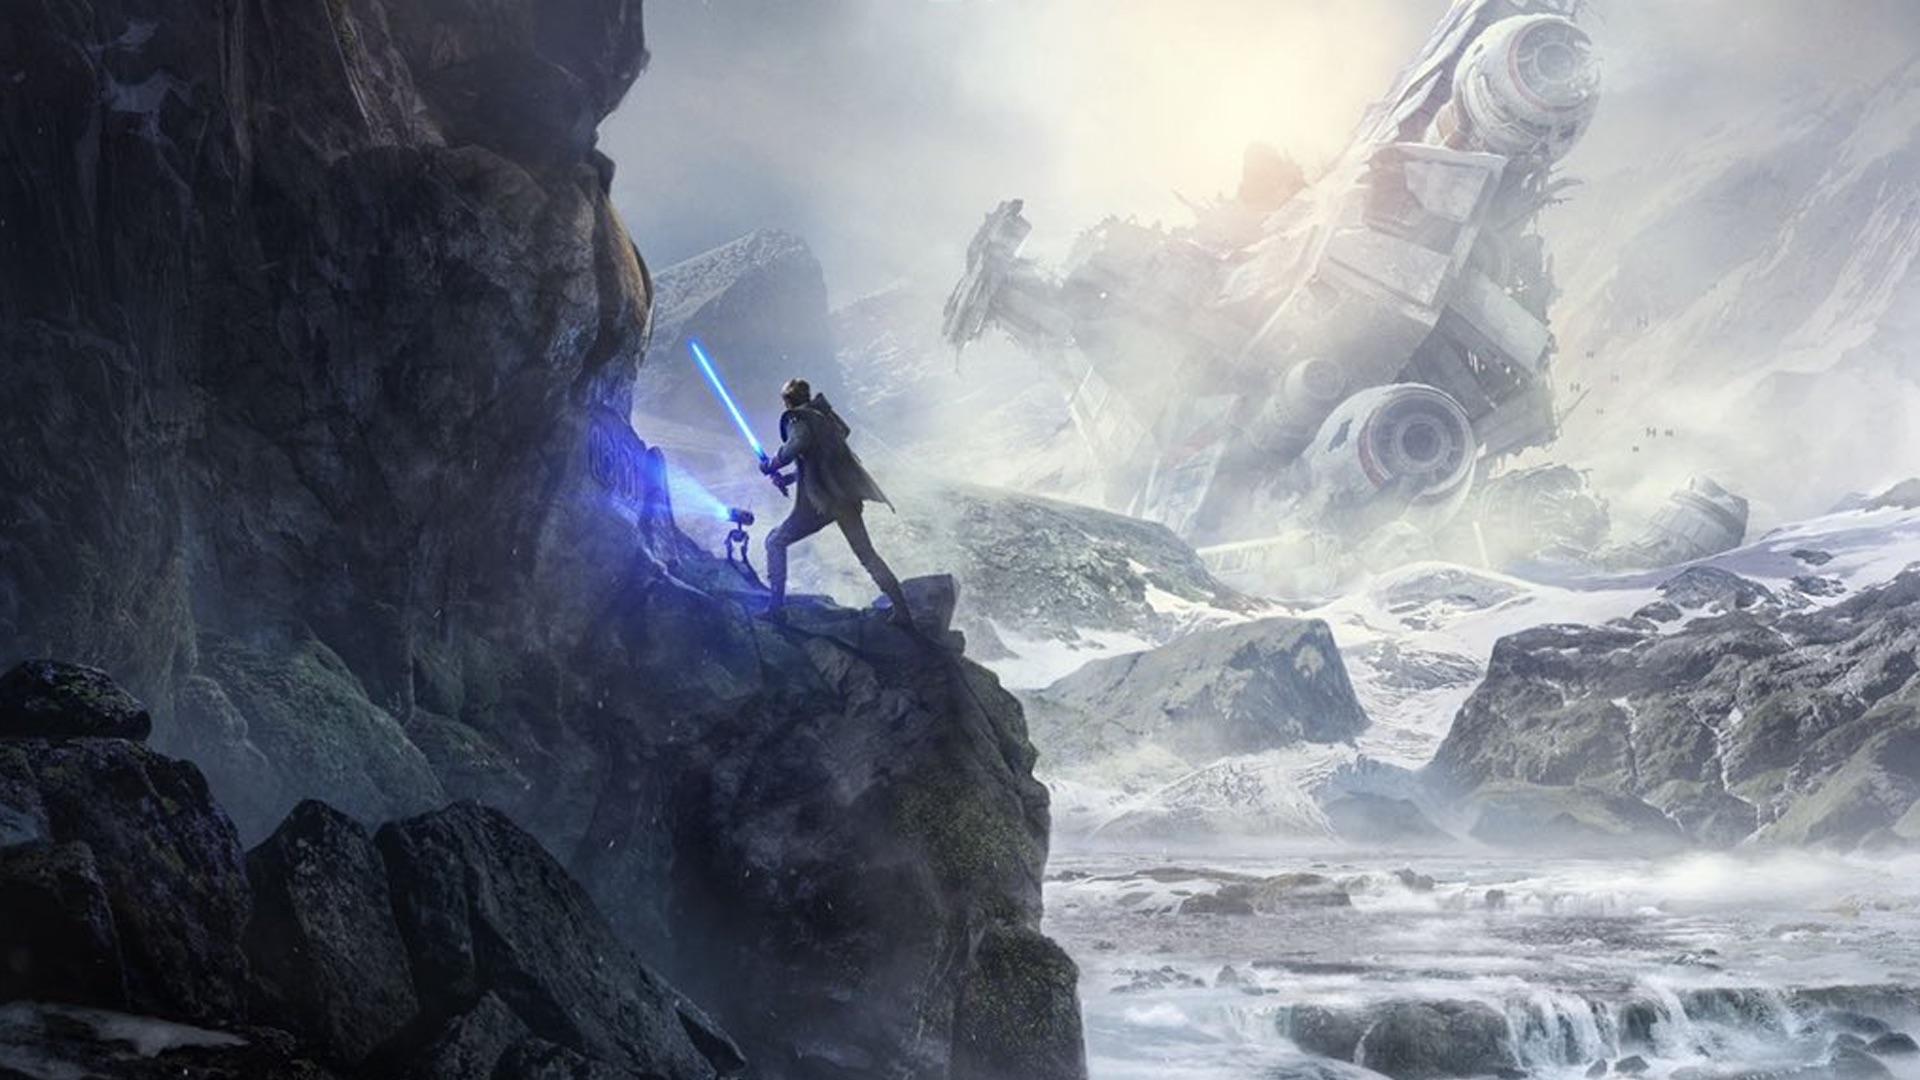 La date de sortie de Star Wars Jedi: Fallen Order fuite